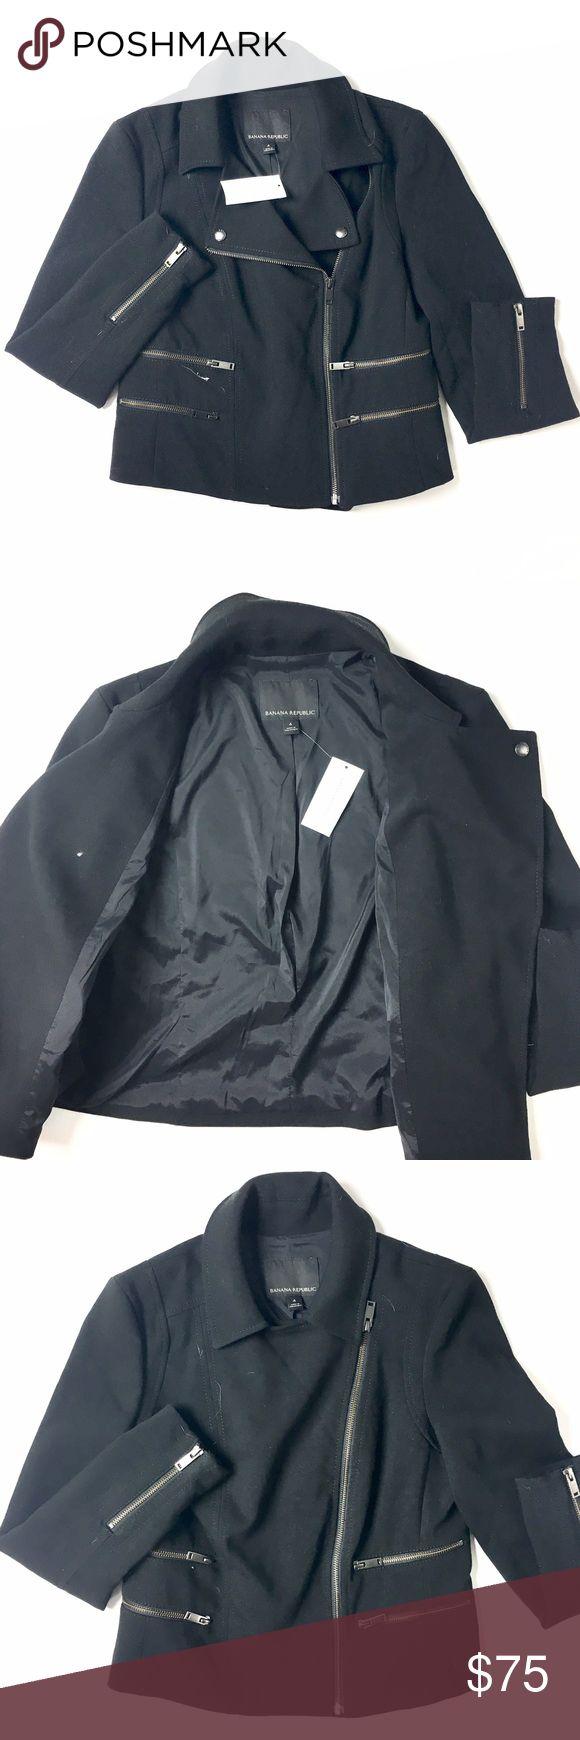 Banana Republic Moto Jacket Banana Republic jacket in moto style. Black, multiple zipper pocket detail, zipper sleeves. New with tags in a size 4. Retail $149. Banana Republic Jackets & Coats